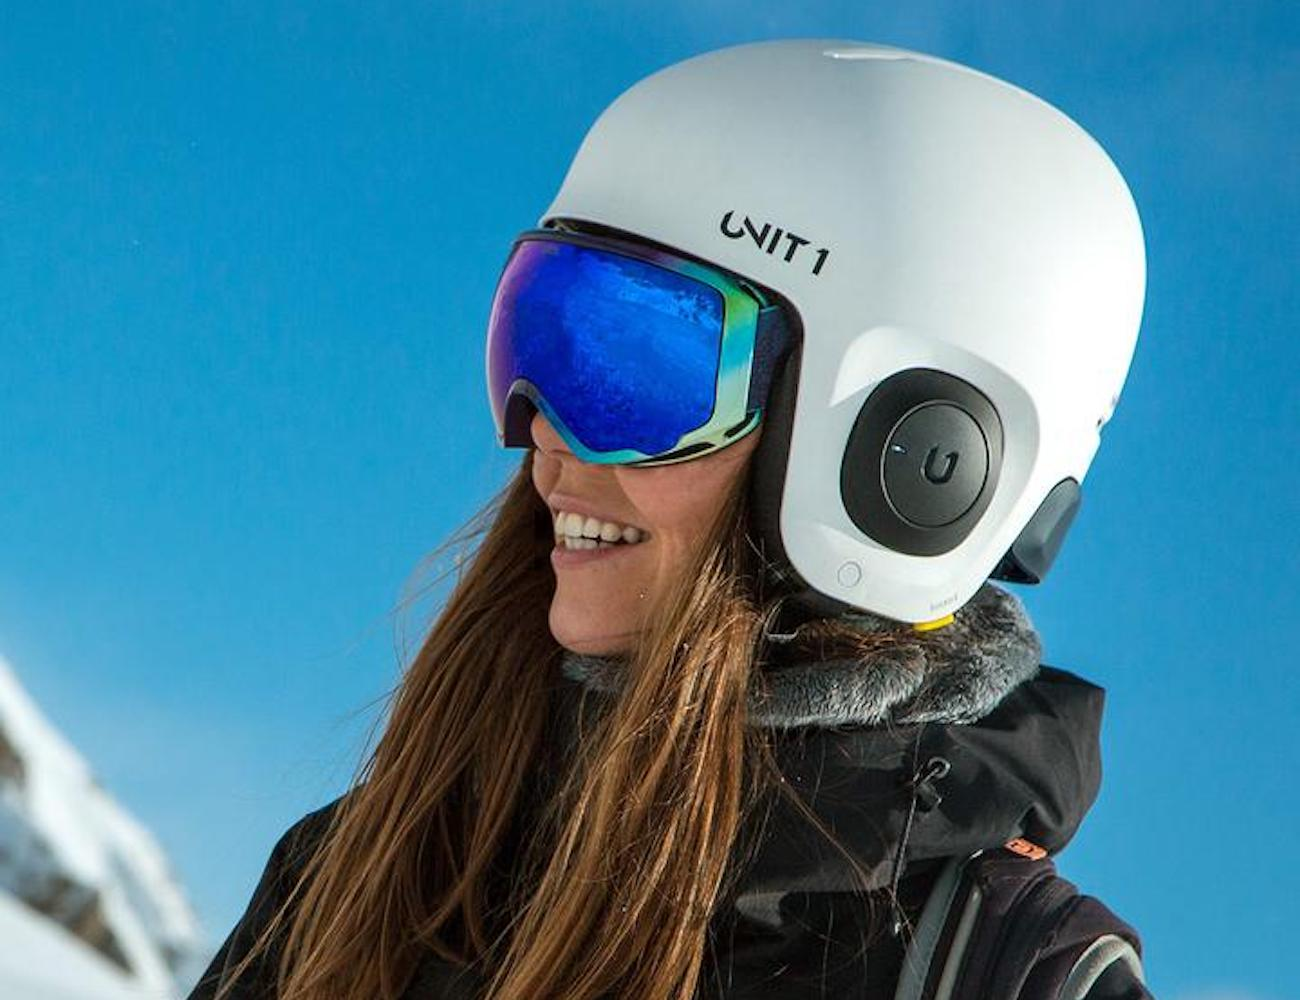 UNIT 1 Soundshield Winter Sports Helmet Kit improves your time on the slopes